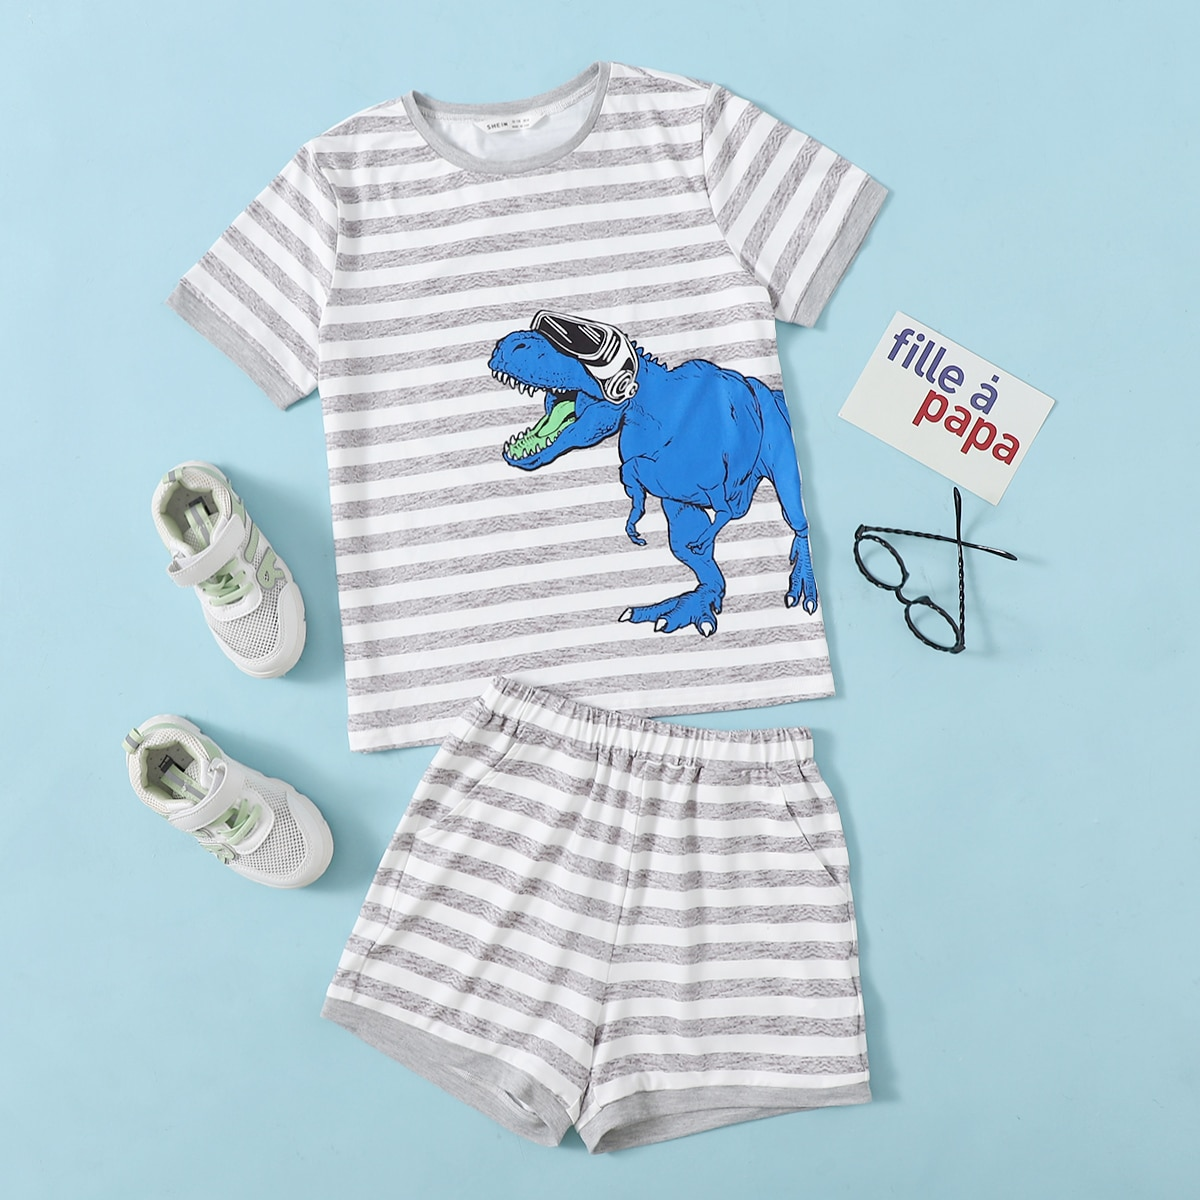 Boys Cartoon and Striped Top & Shorts Set